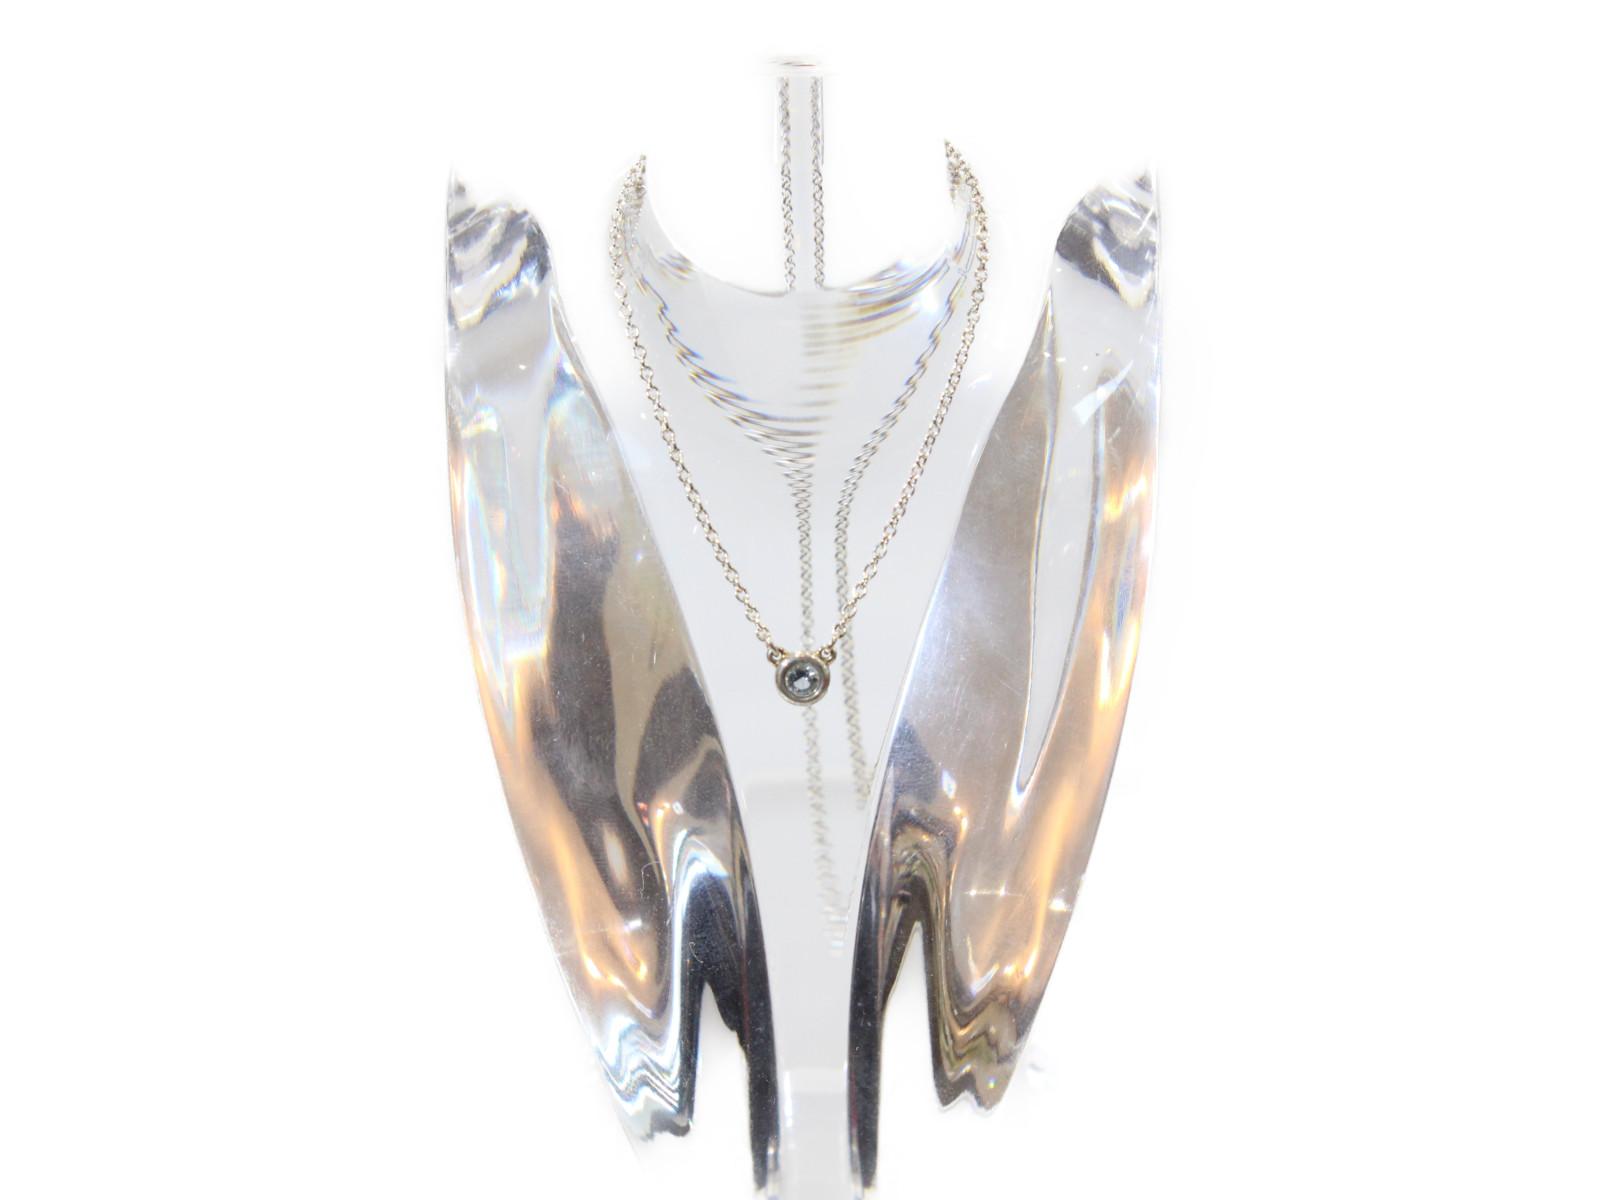 【Tiffany&㏇(ティファニー)】バイザヤードネックレスアクアマリン0.06ct 40cmネックレス シンプルギフト包装可 【中古】